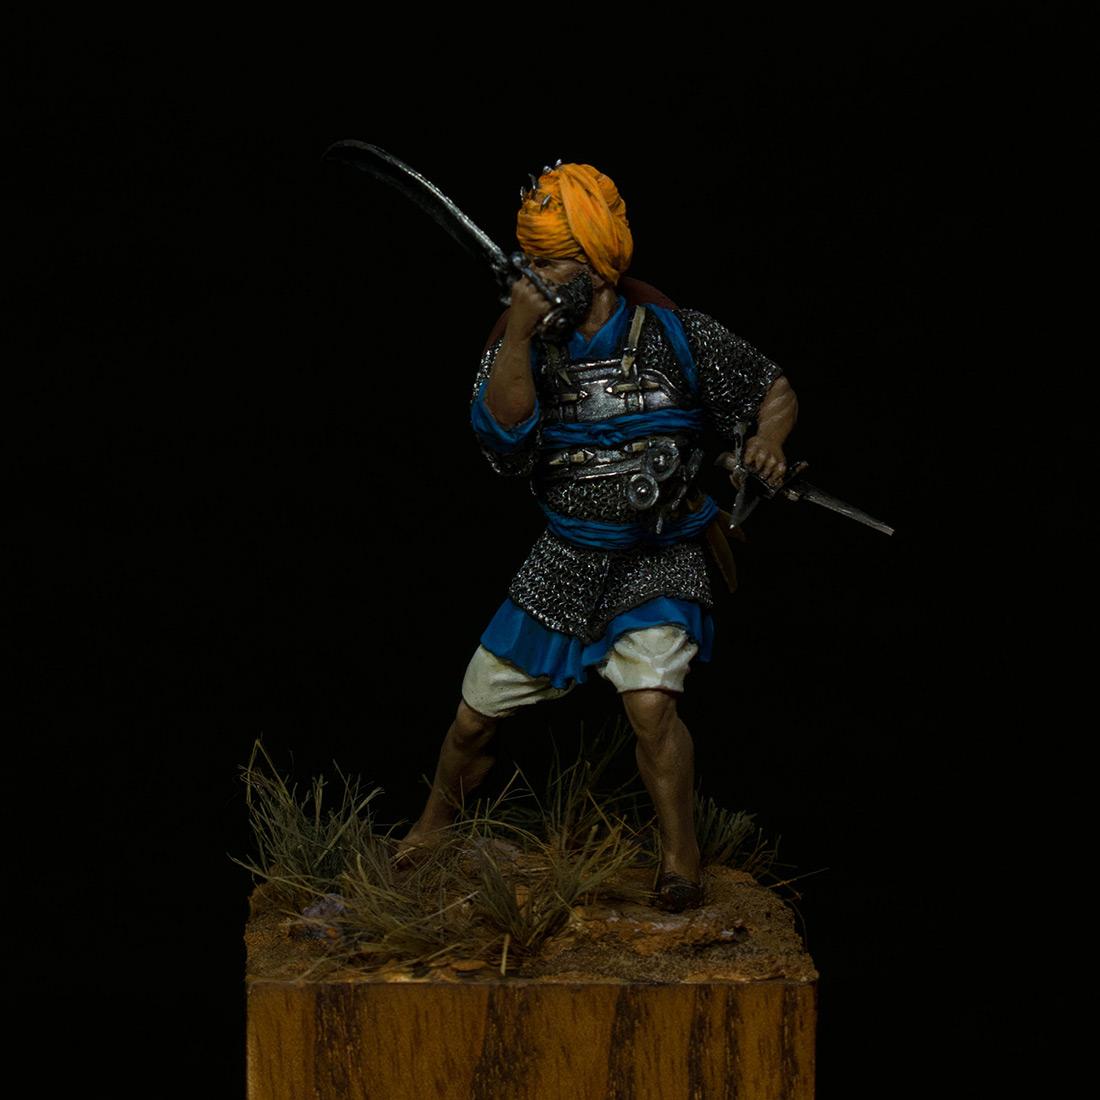 Figures: Sikh warrior, photo #1